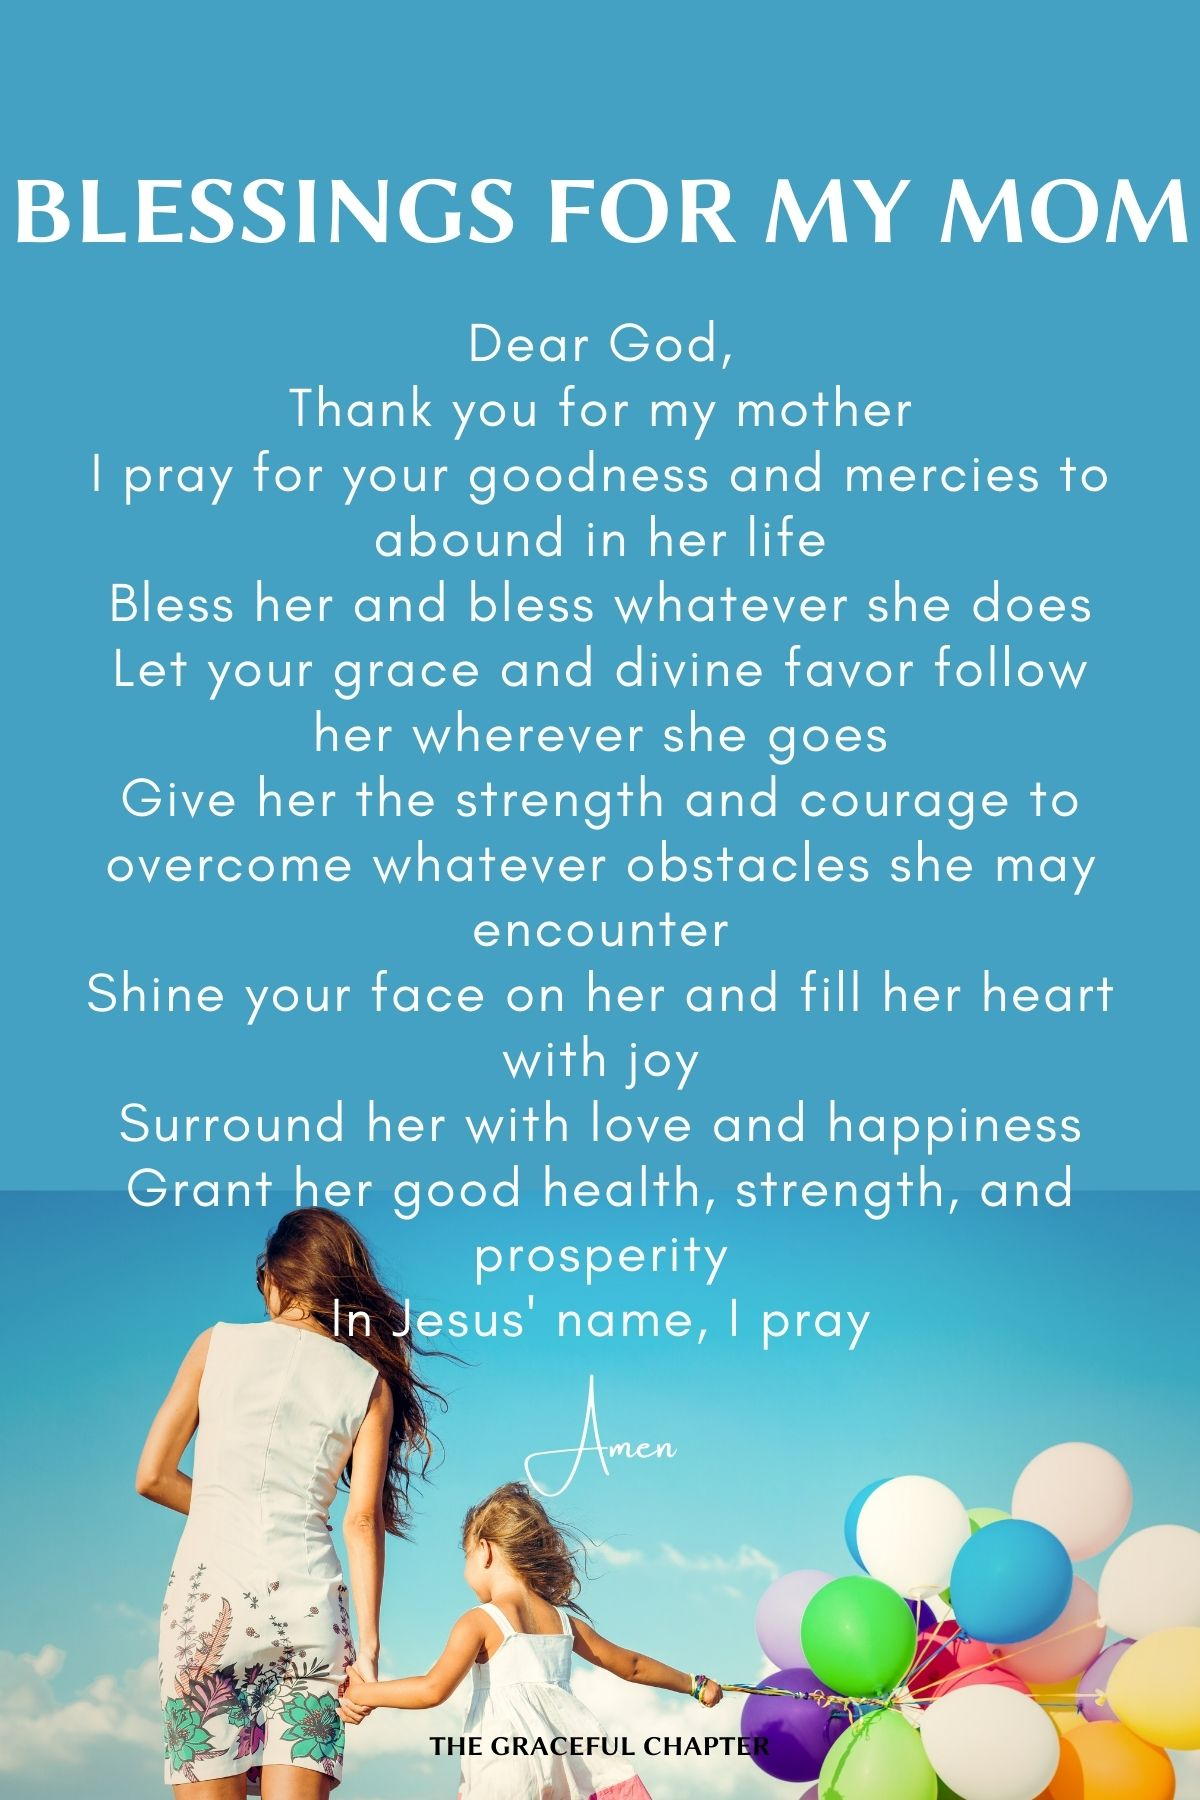 Blessings for my mom